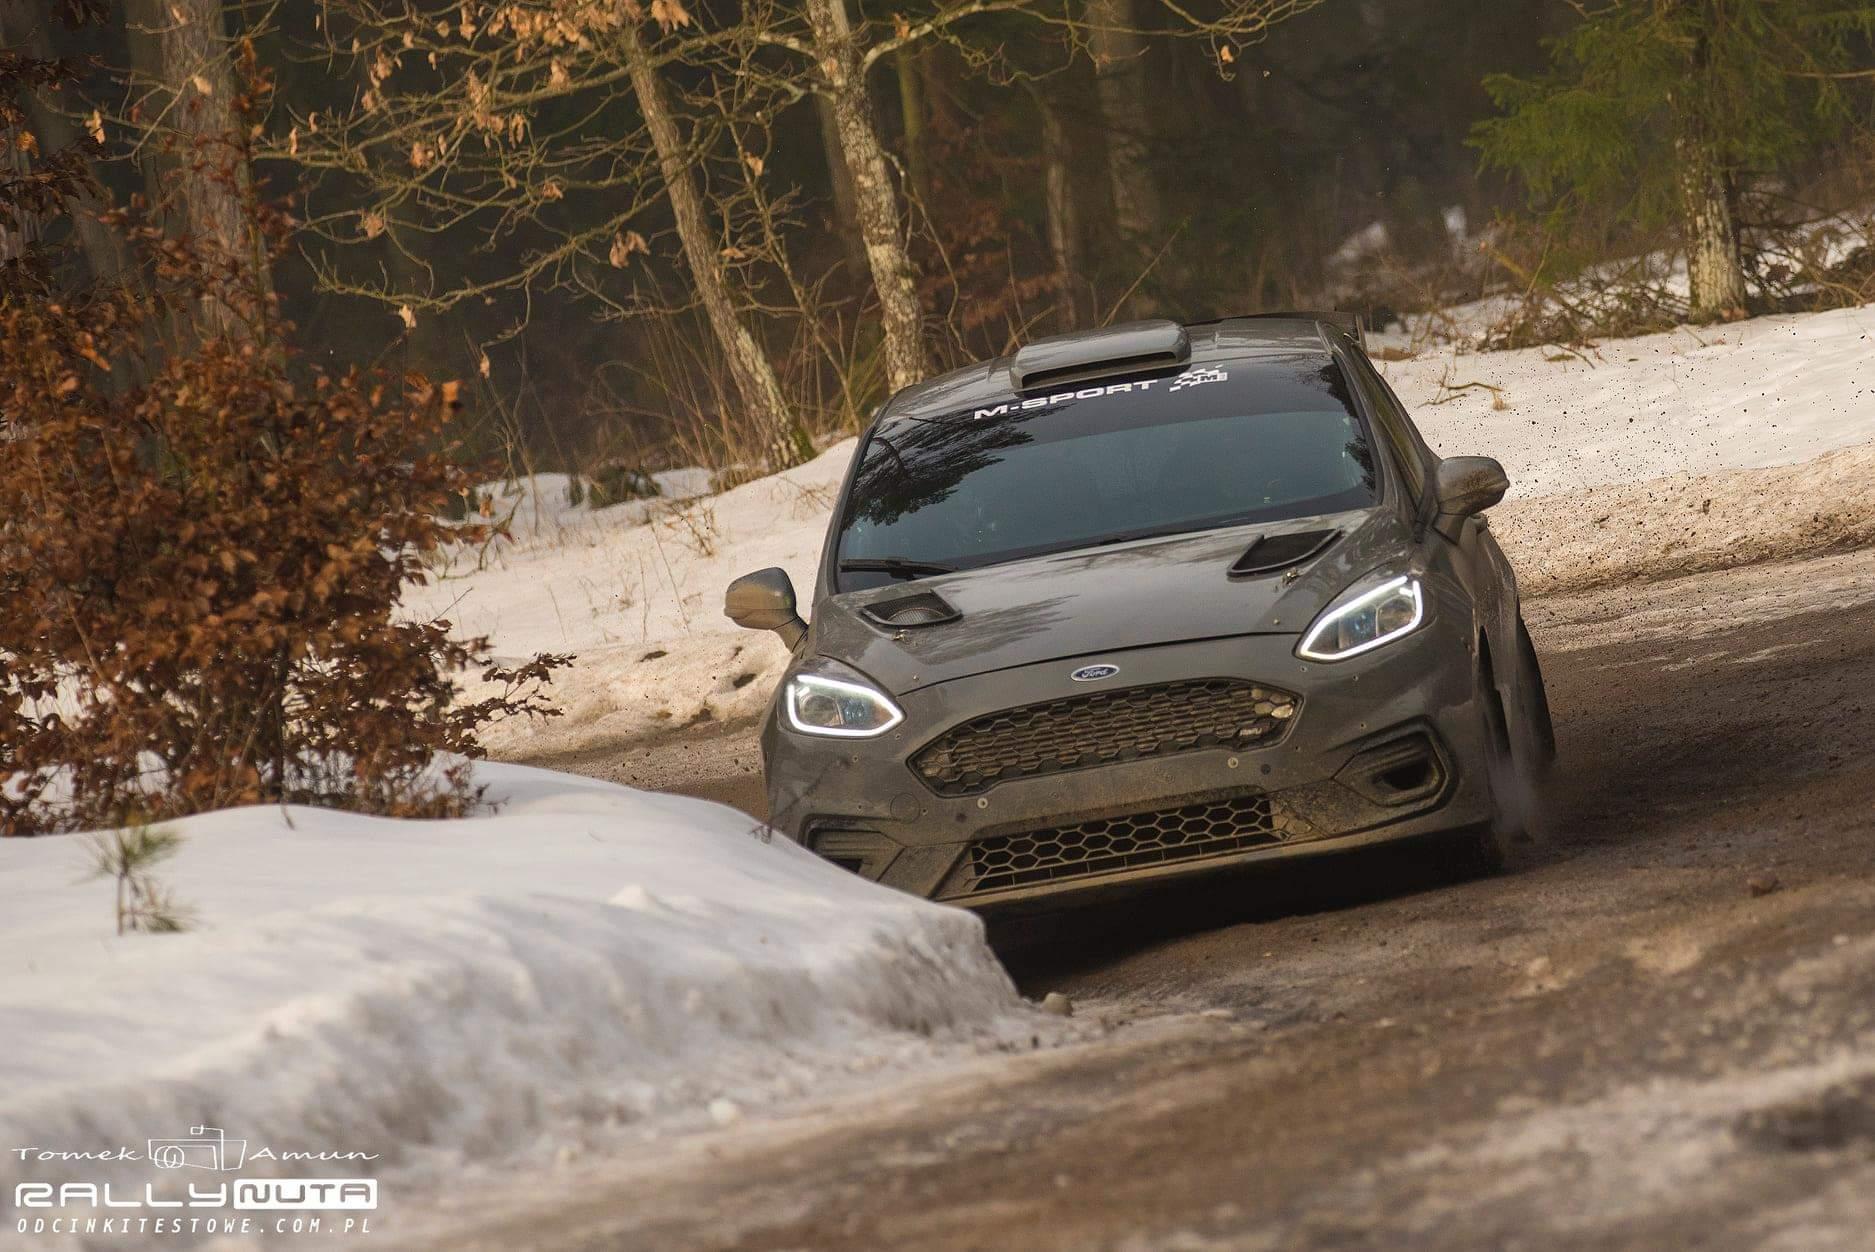 FIA European Rally Championship: Temporada 2021 - Página 3 Eu8GRh_XcAQA0q8?format=jpg&name=large